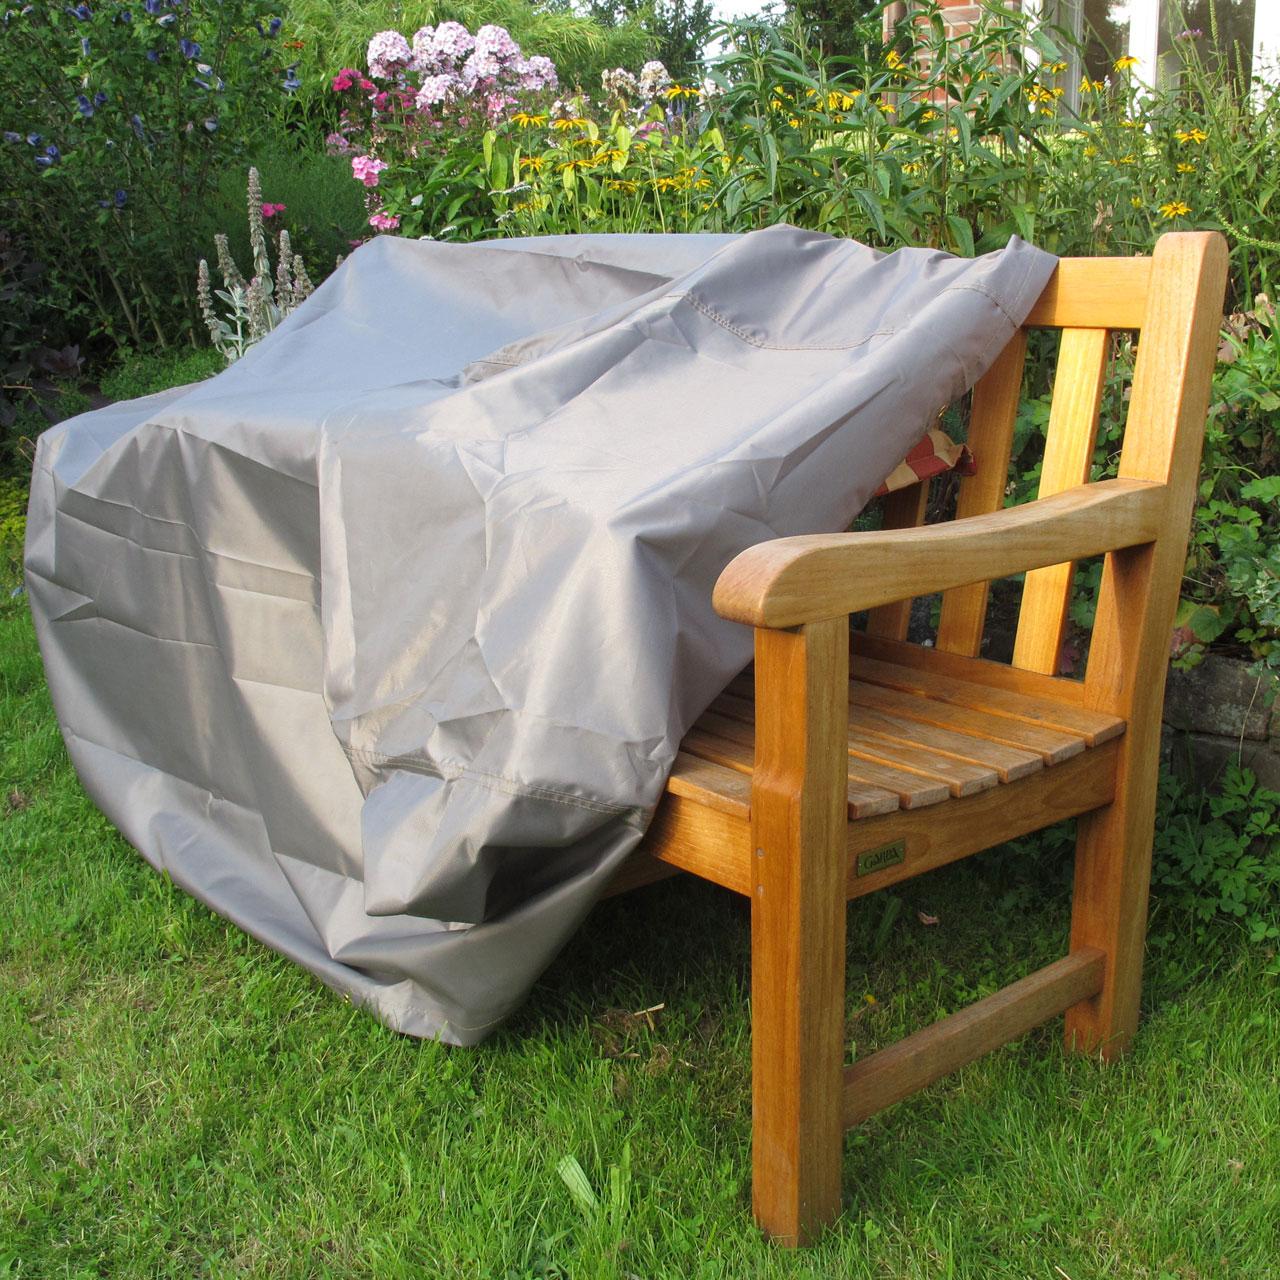 gartenmobel abdeckung winter interessante. Black Bedroom Furniture Sets. Home Design Ideas